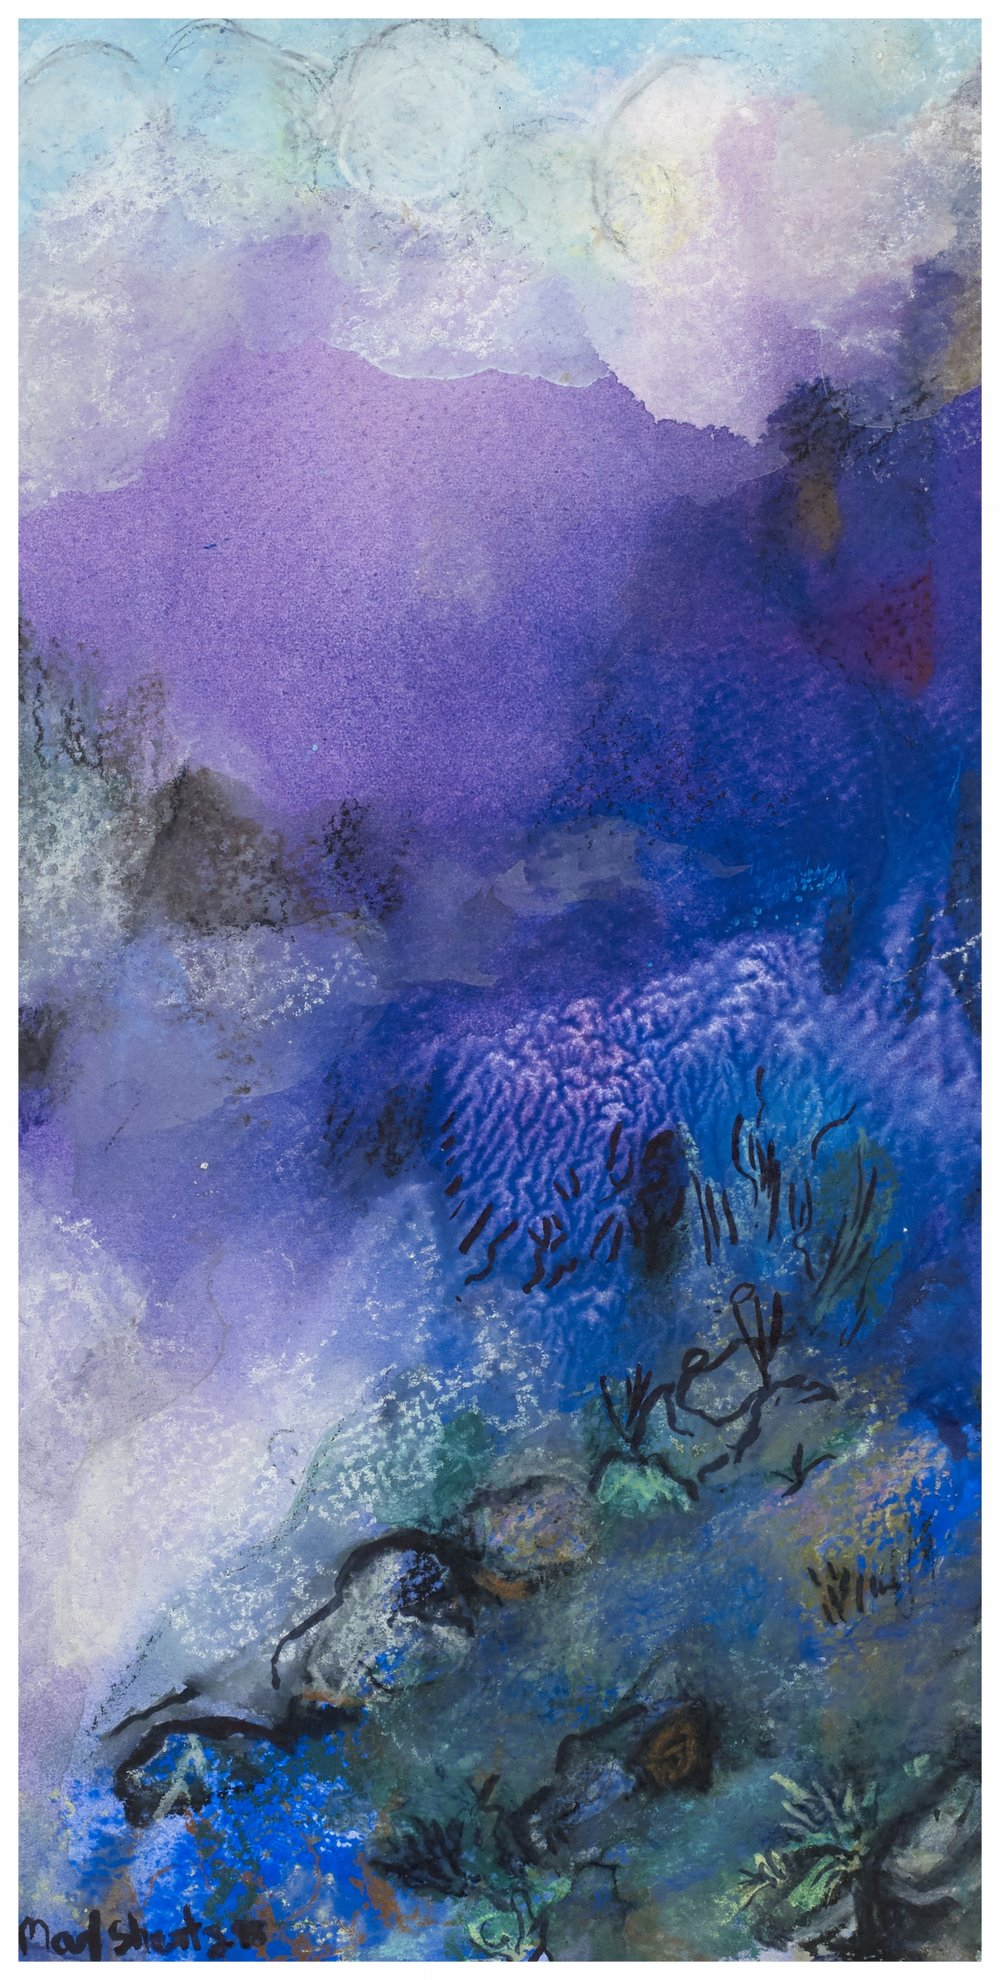 The Rising Of The Mist 1998 11x6 Mixed Medium